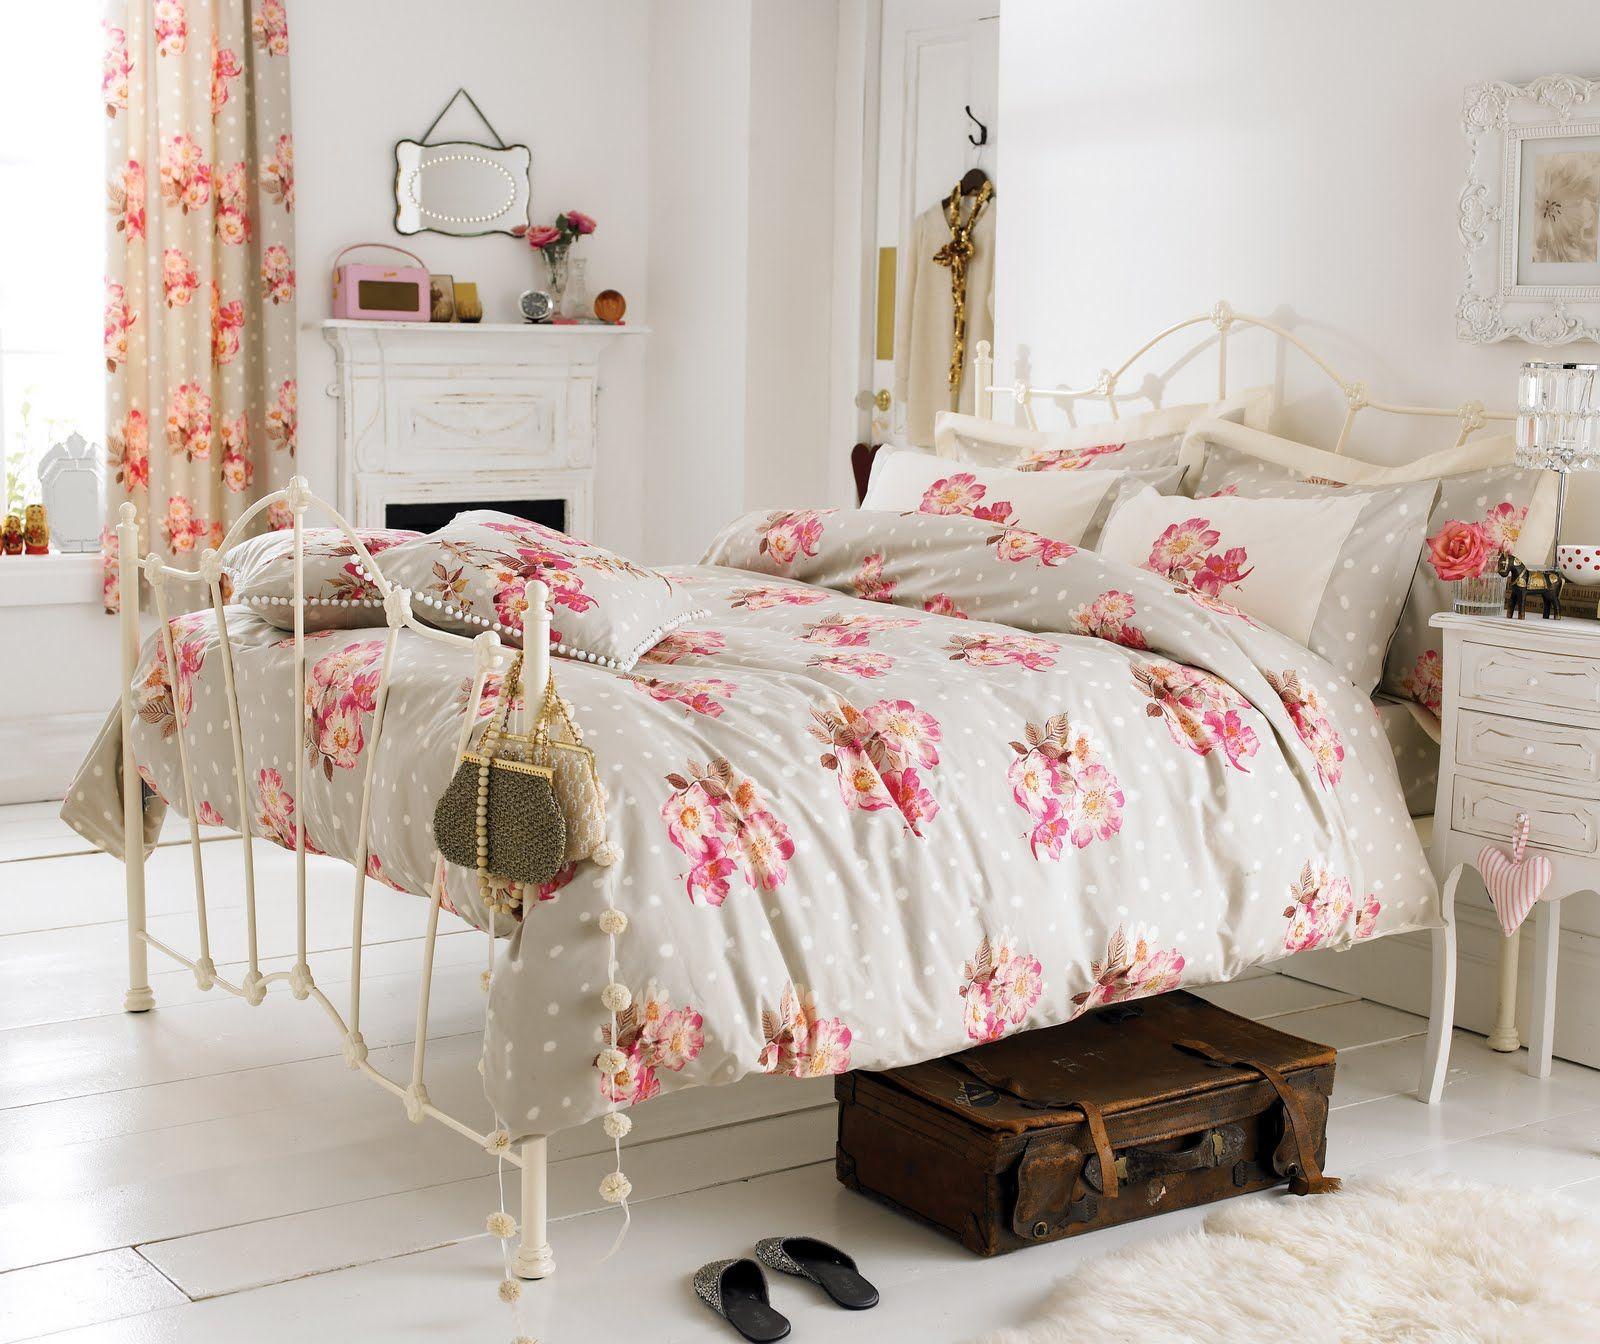 d coration de la chambre romantique 55 id es shabby chic. Black Bedroom Furniture Sets. Home Design Ideas